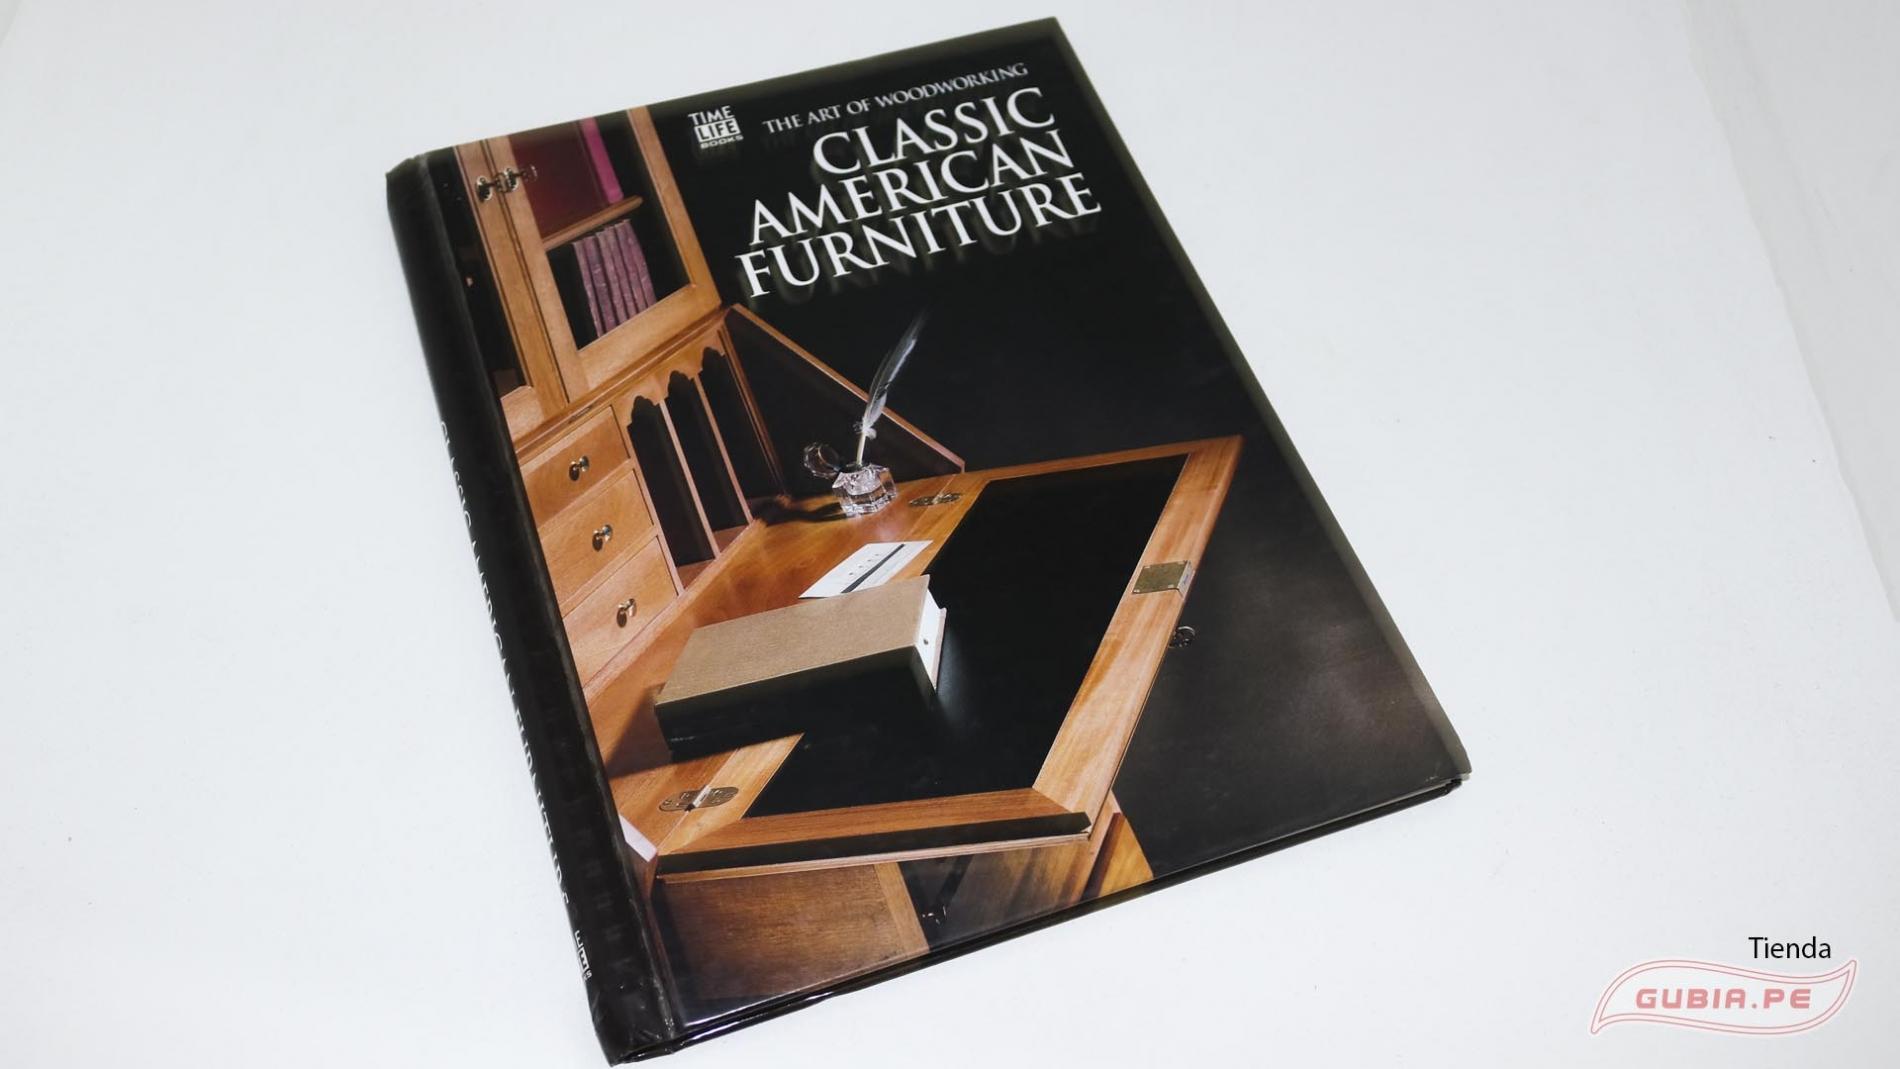 GUB0062-Libro de ebanisteria en ingles : Classic American Furniture-max-1.